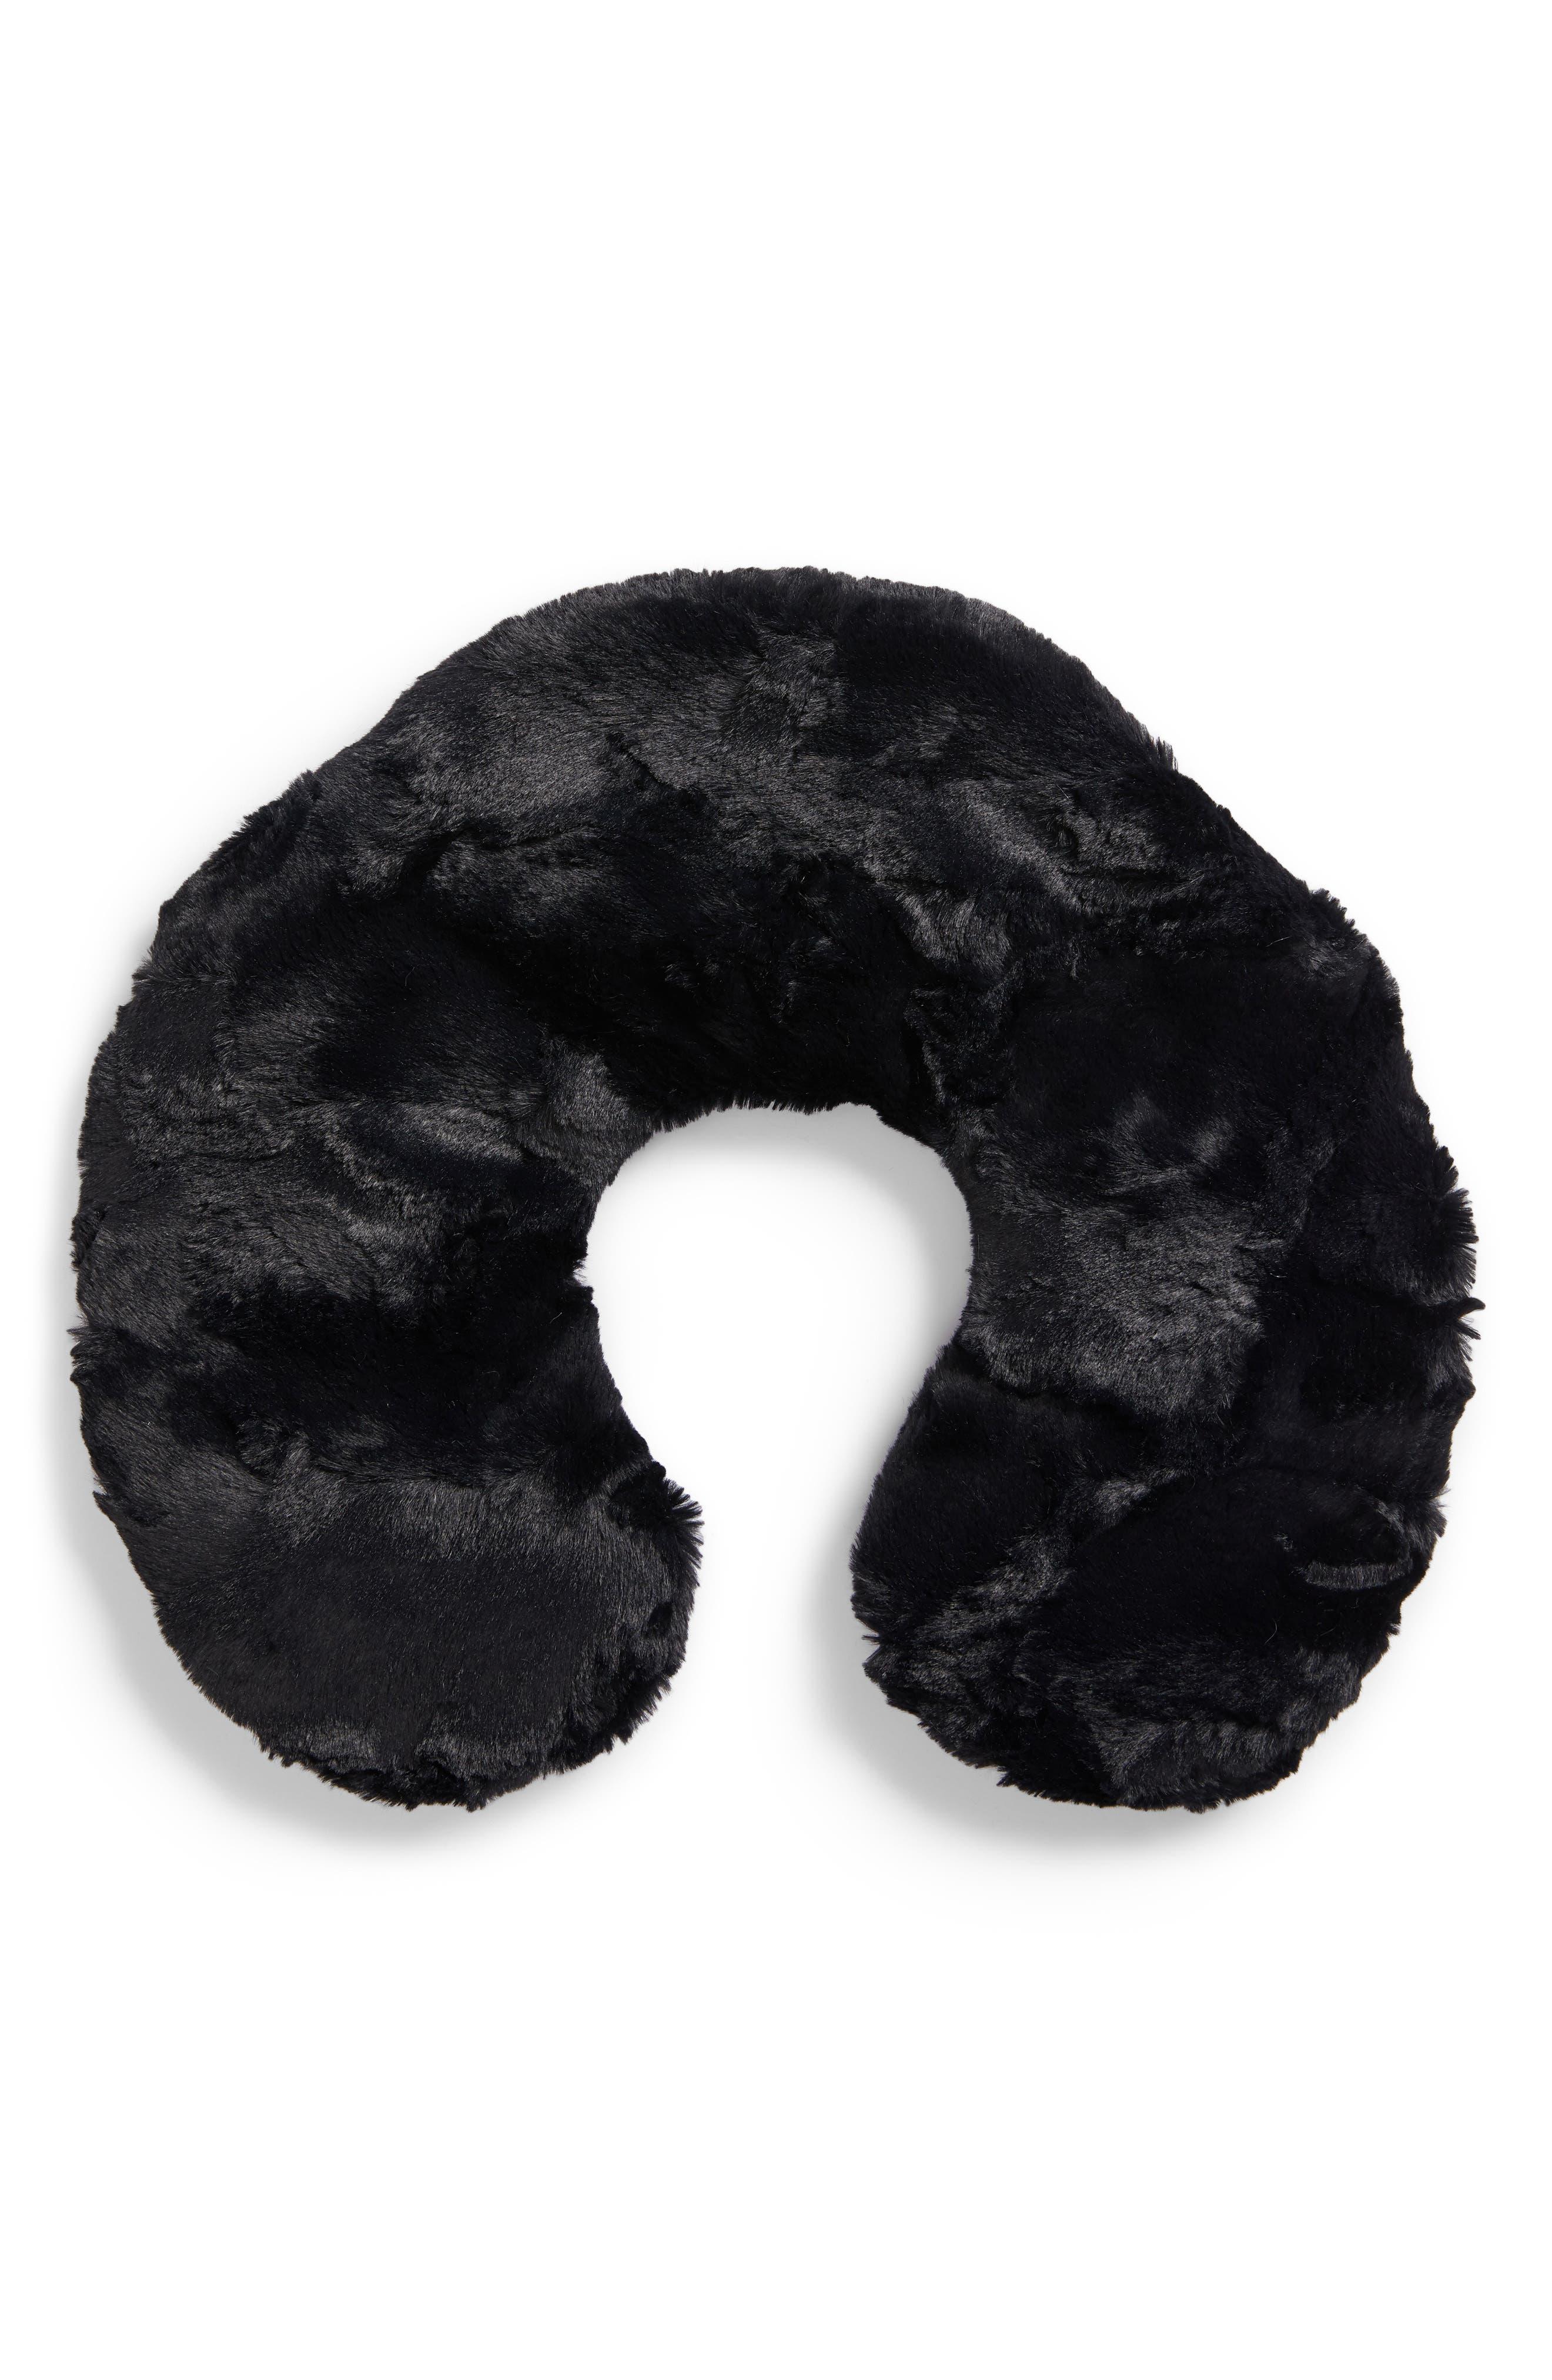 Caviar Black Neck Pillow,                             Main thumbnail 1, color,                             NO COLOR